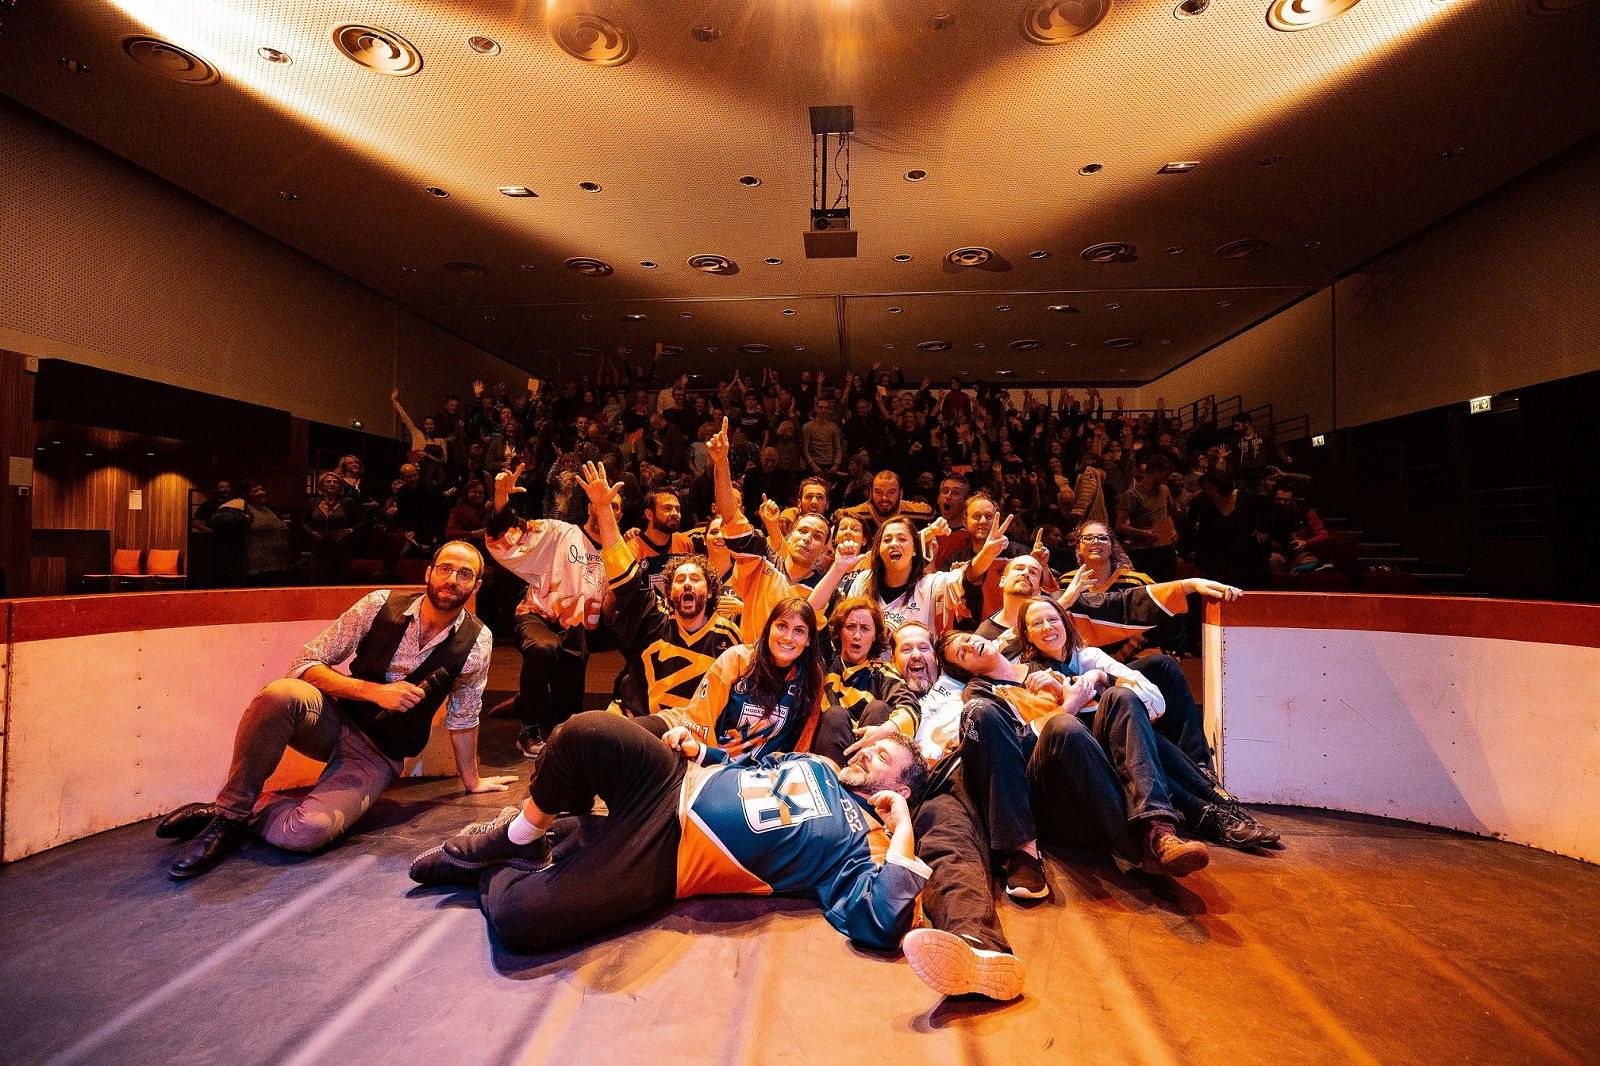 Festival international d'improvisation : Festikheim 4 1/2